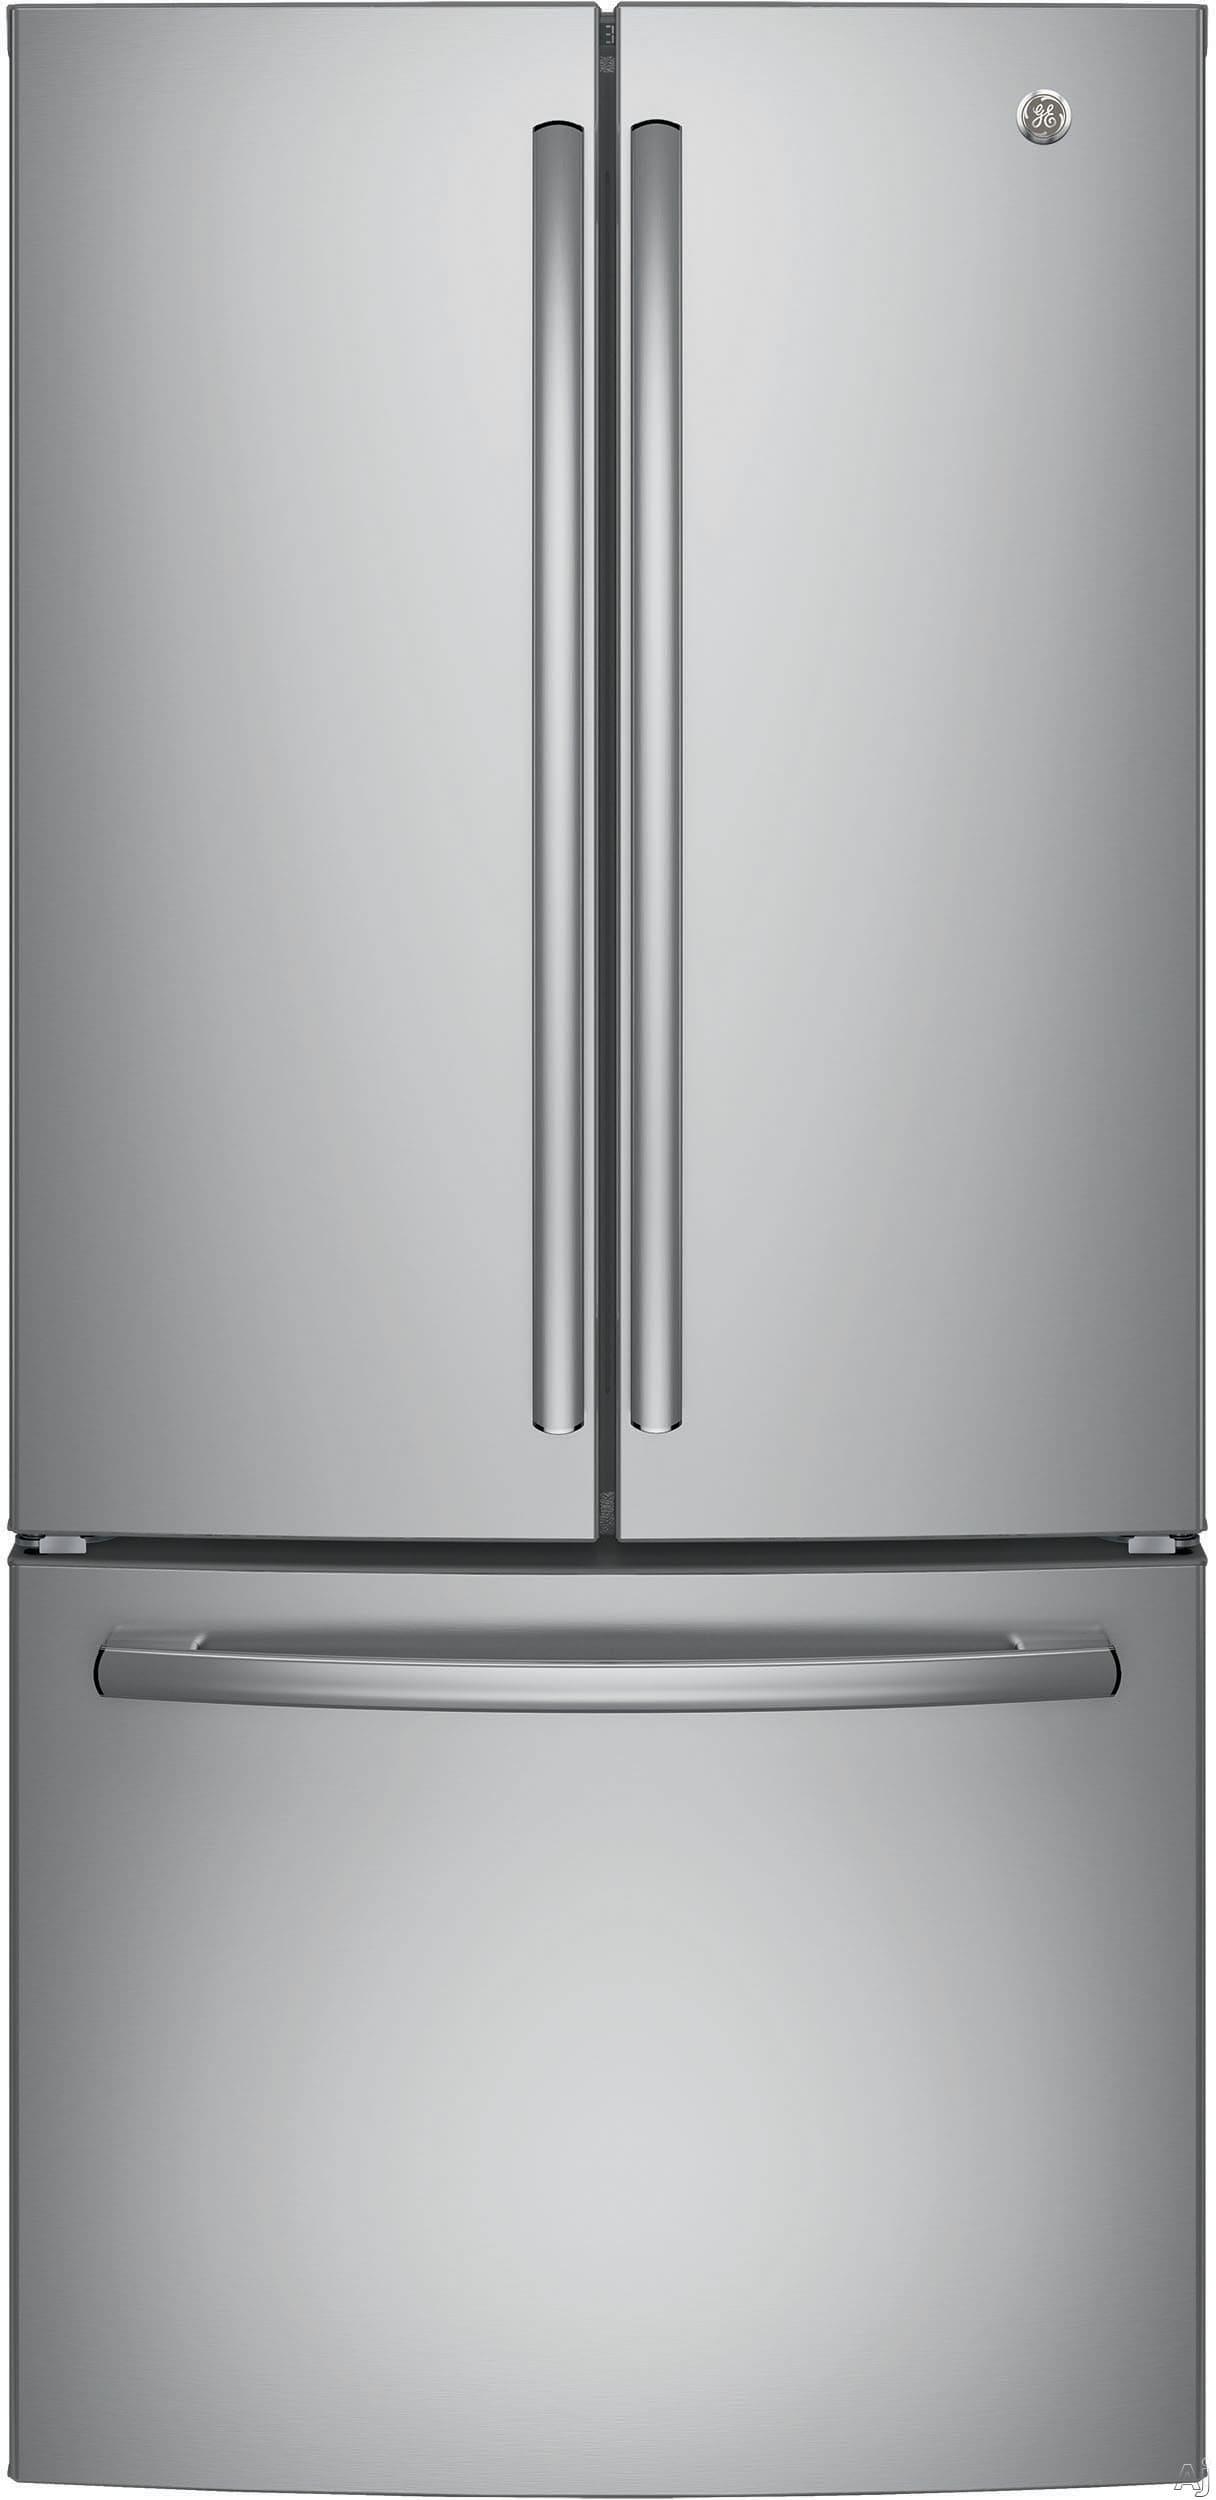 GE GNE25JSKSS 33 Inch French Door Refrigerator with Internal Water